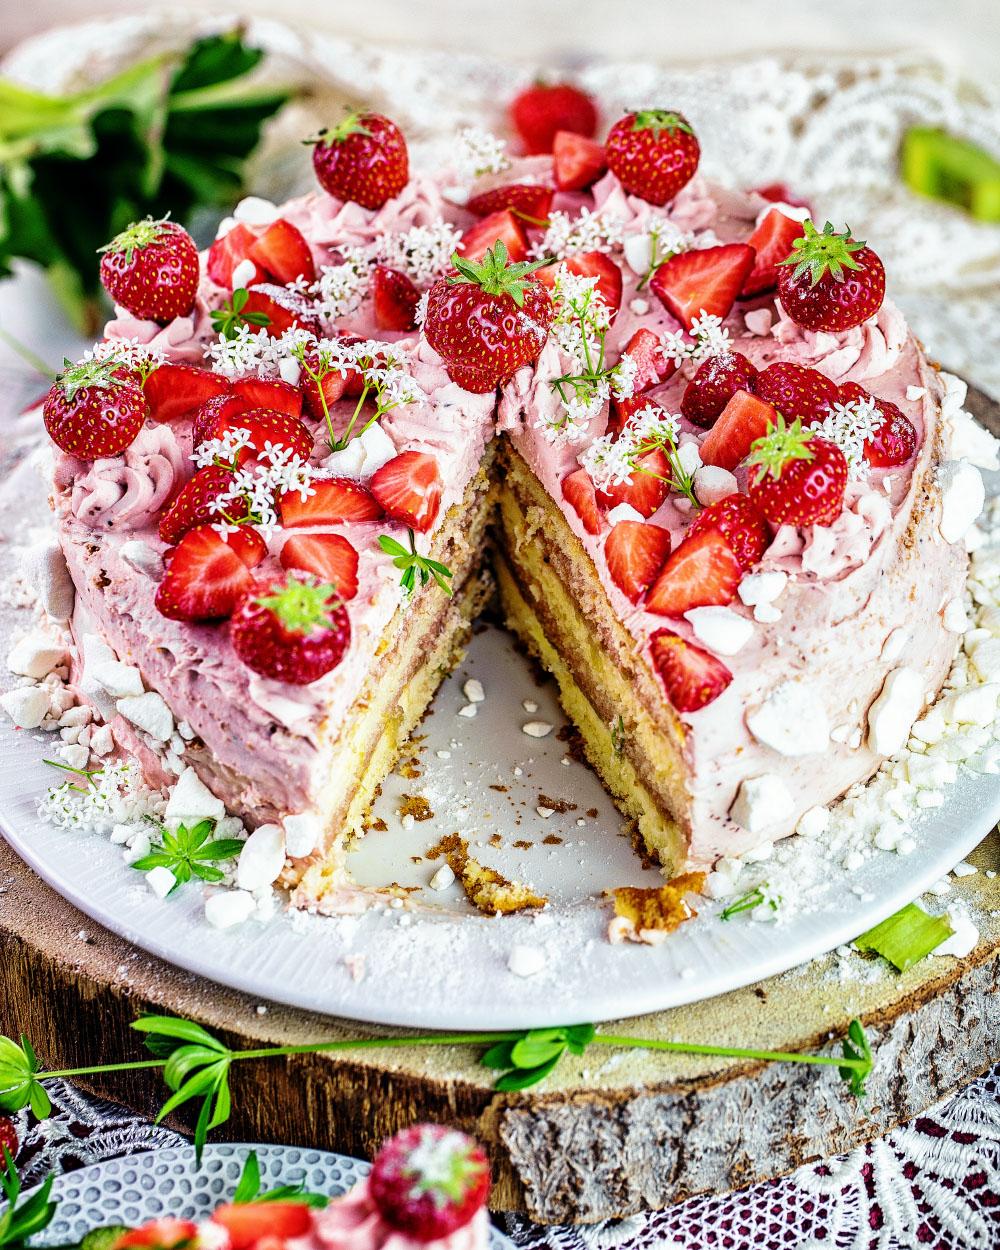 Rhabarber-Erdbeer Torte mit fertigen Böden